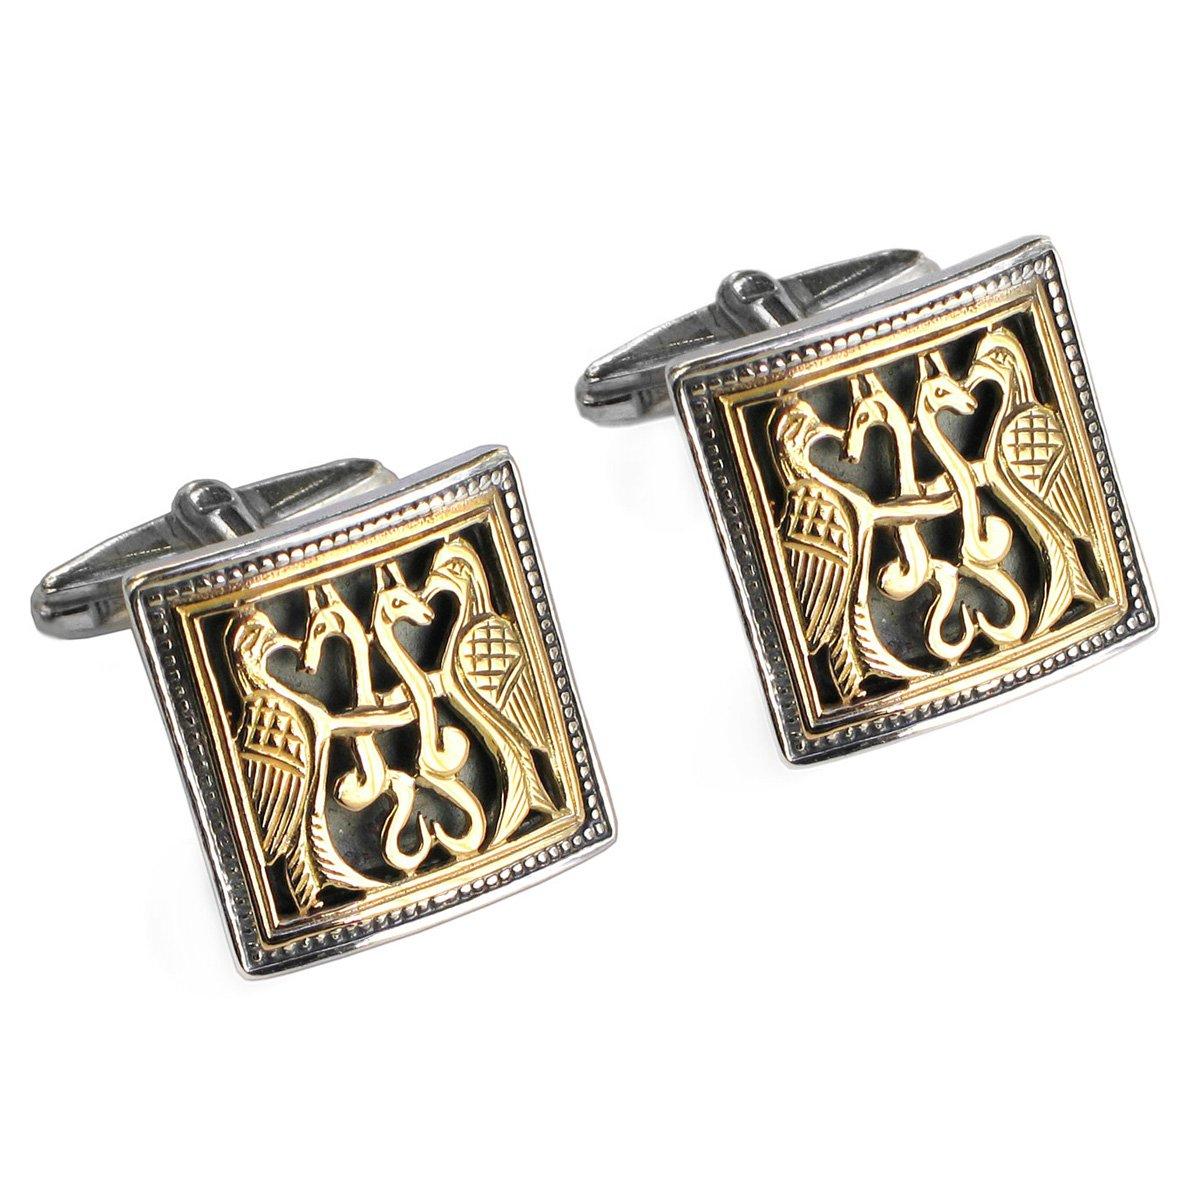 Gerochristo 7011 - Solid 18K Gold & Silver Medieval Byzantine Cufflinks